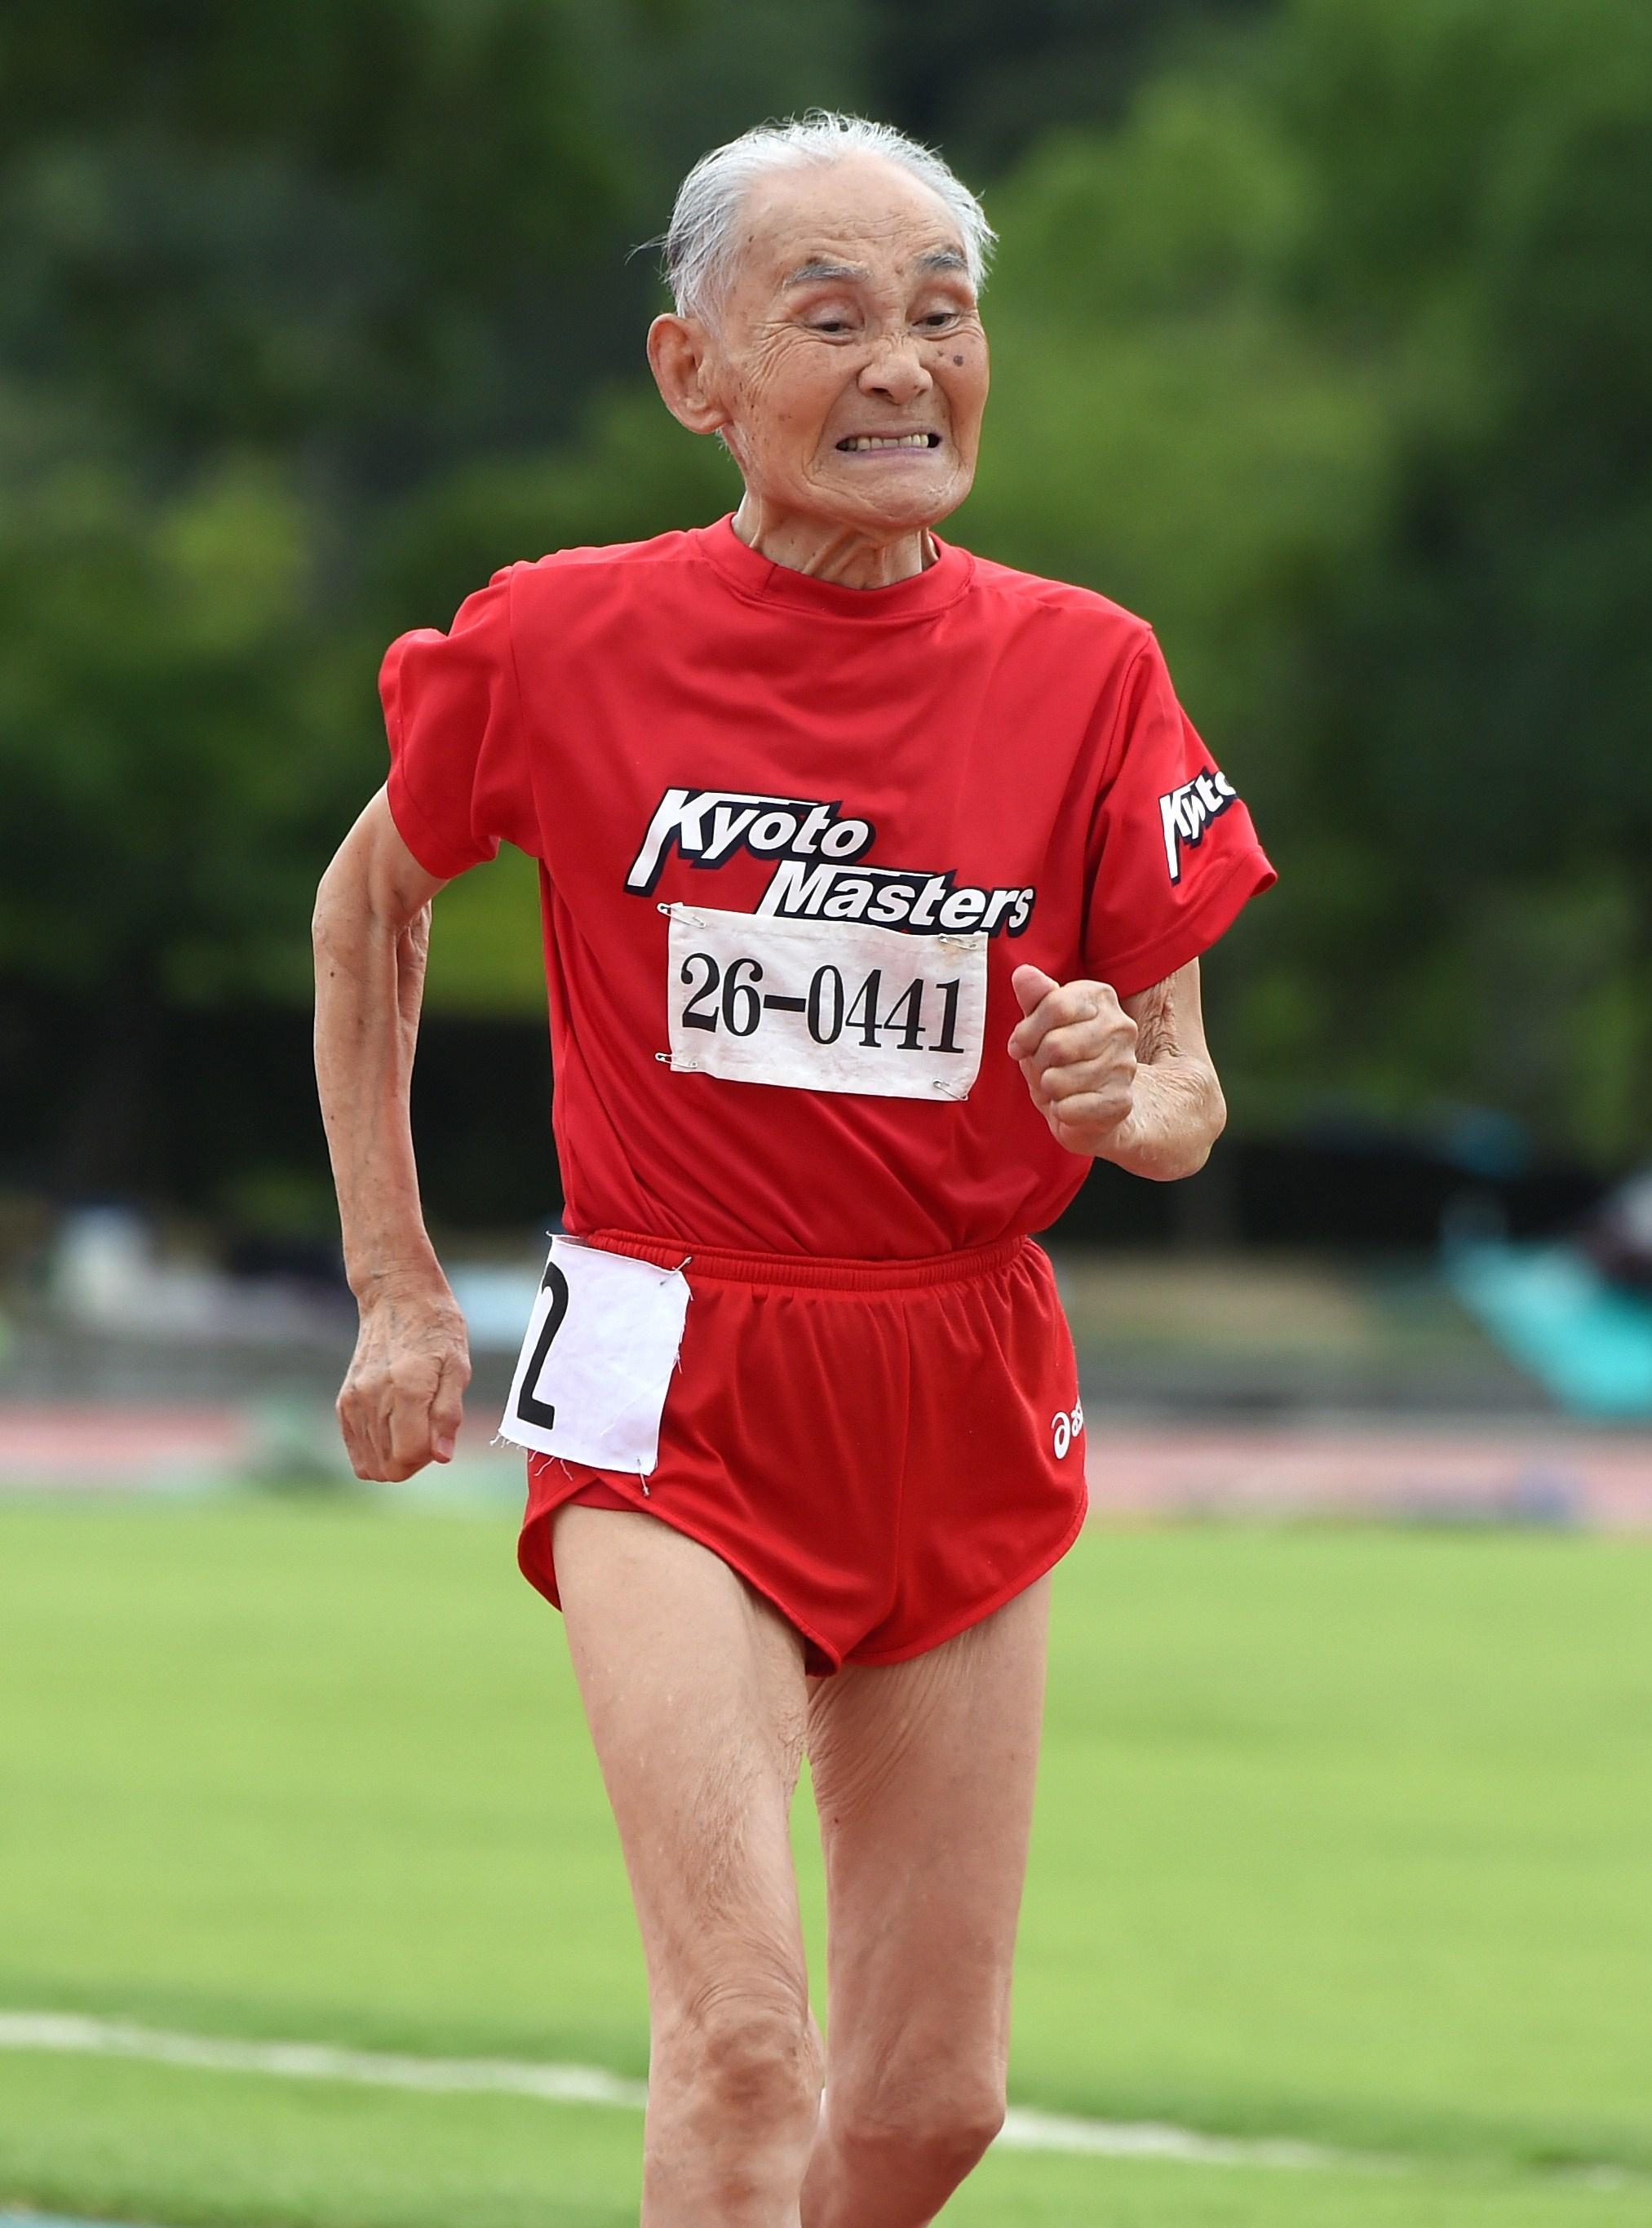 Hidekichi Miyazaki during his record setting 100m race